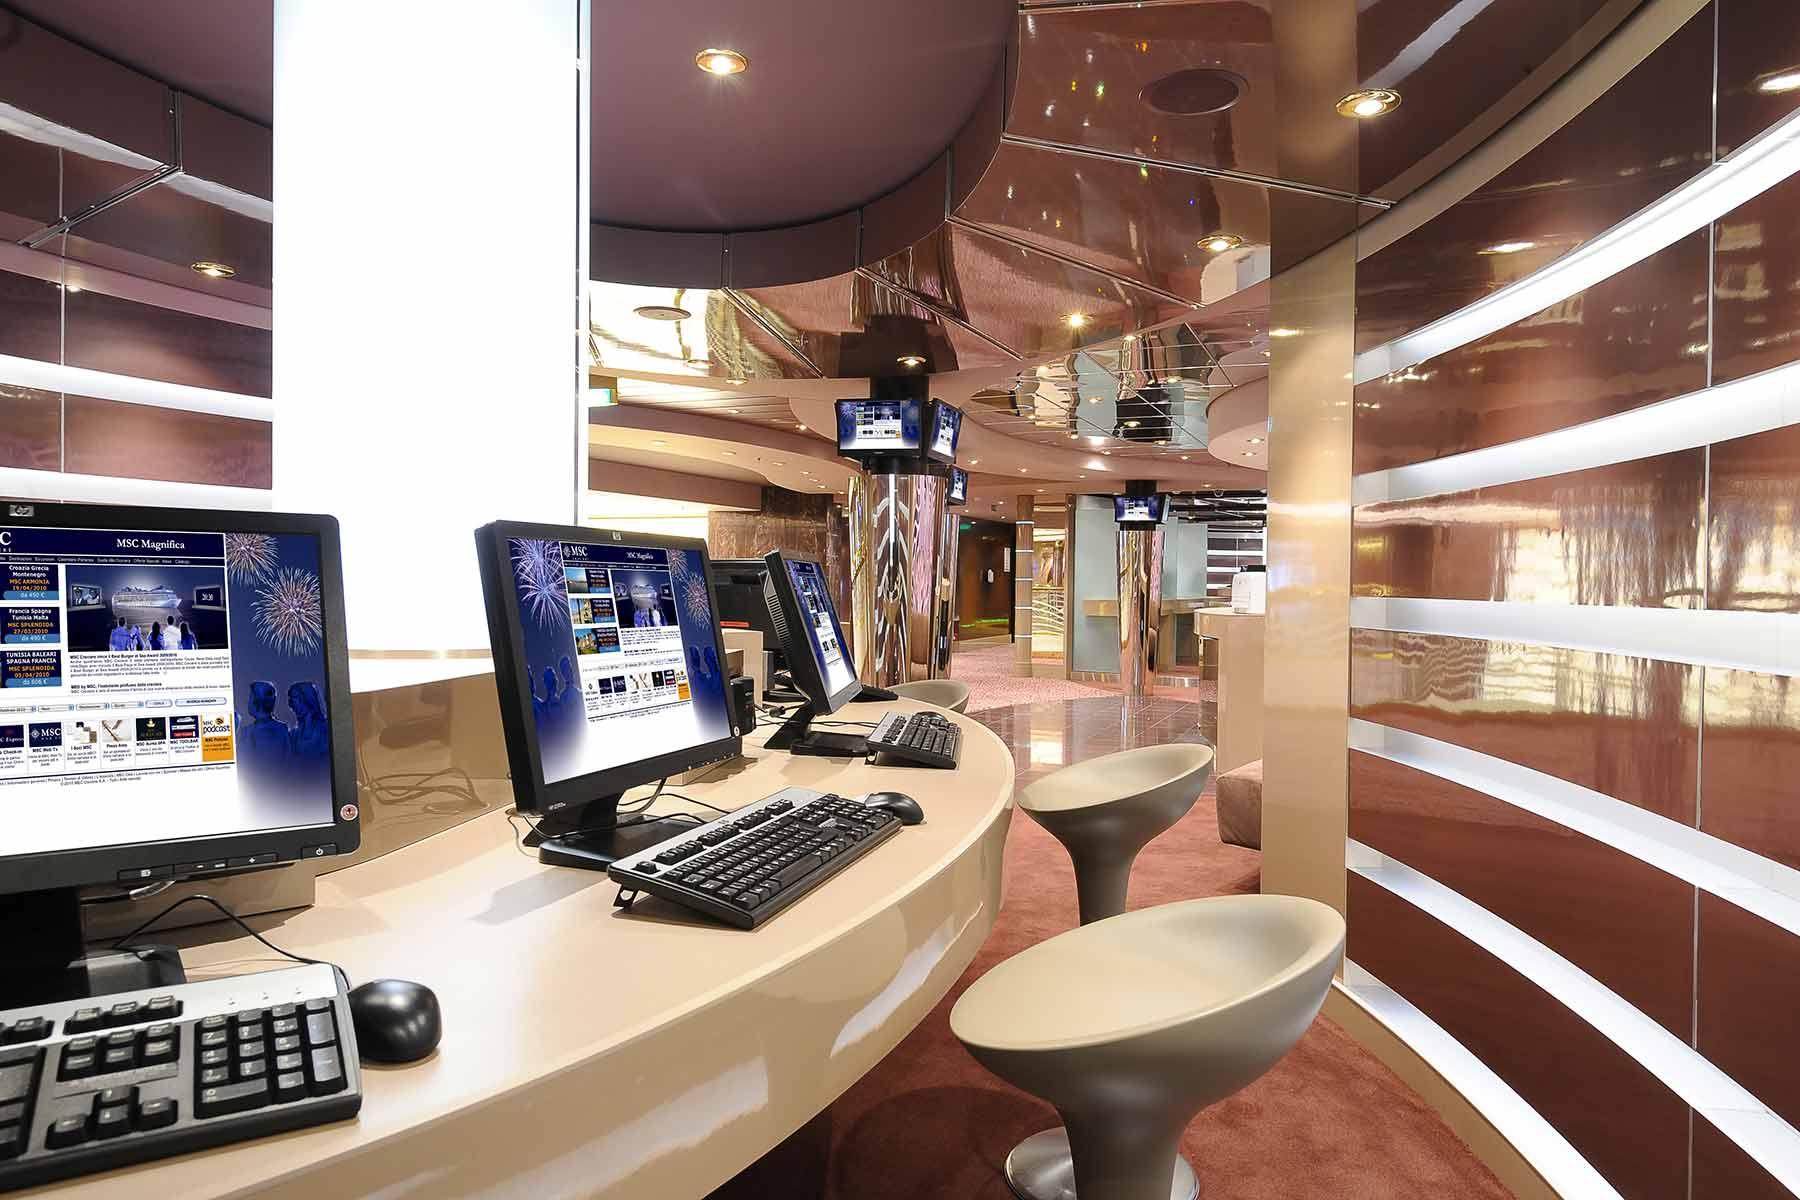 sala internet nave da crociera